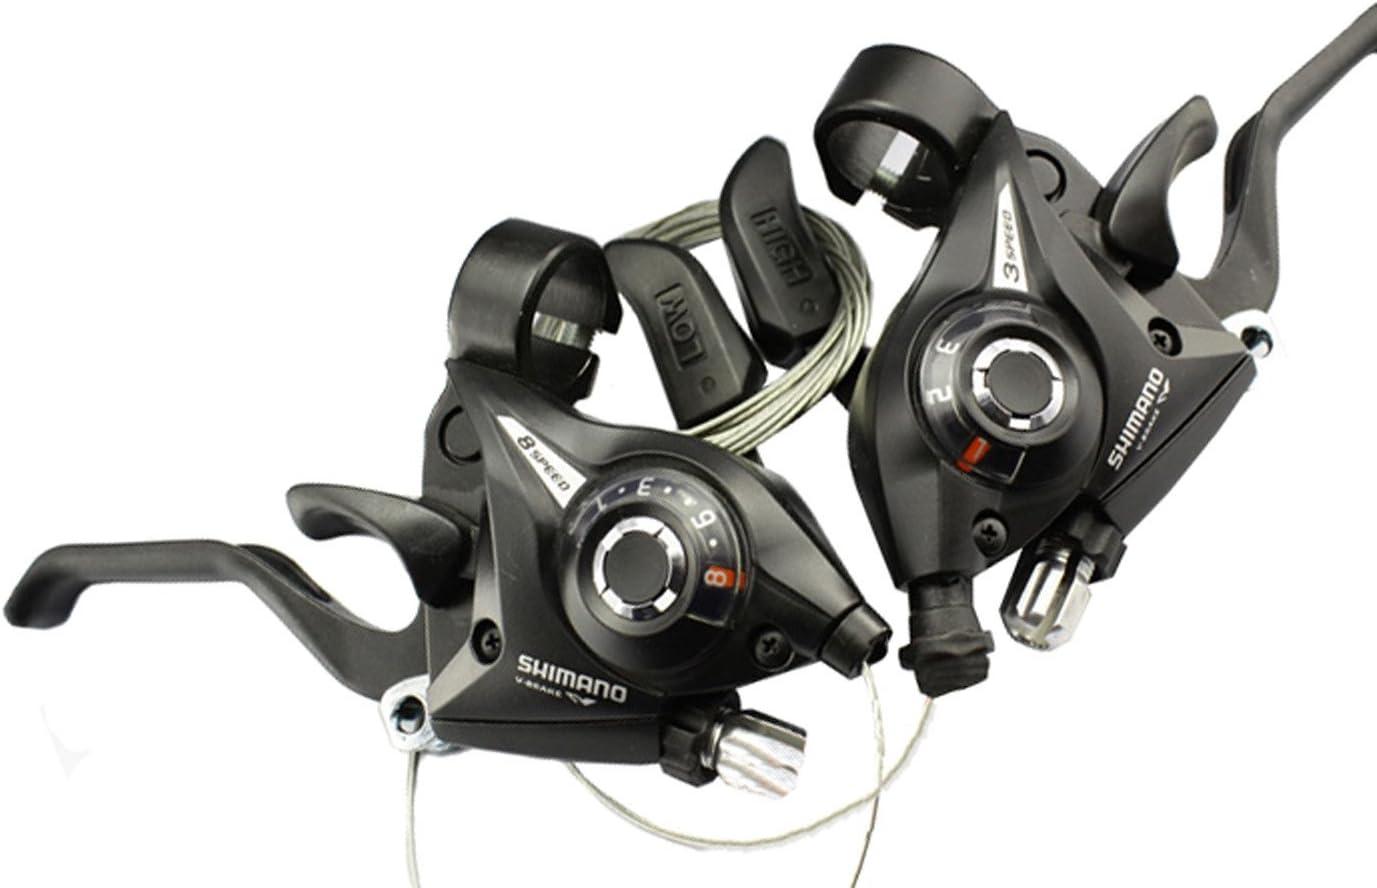 5 x Shimano SL-M310 3 Speed Gear Shifter avec câbles Job Lot